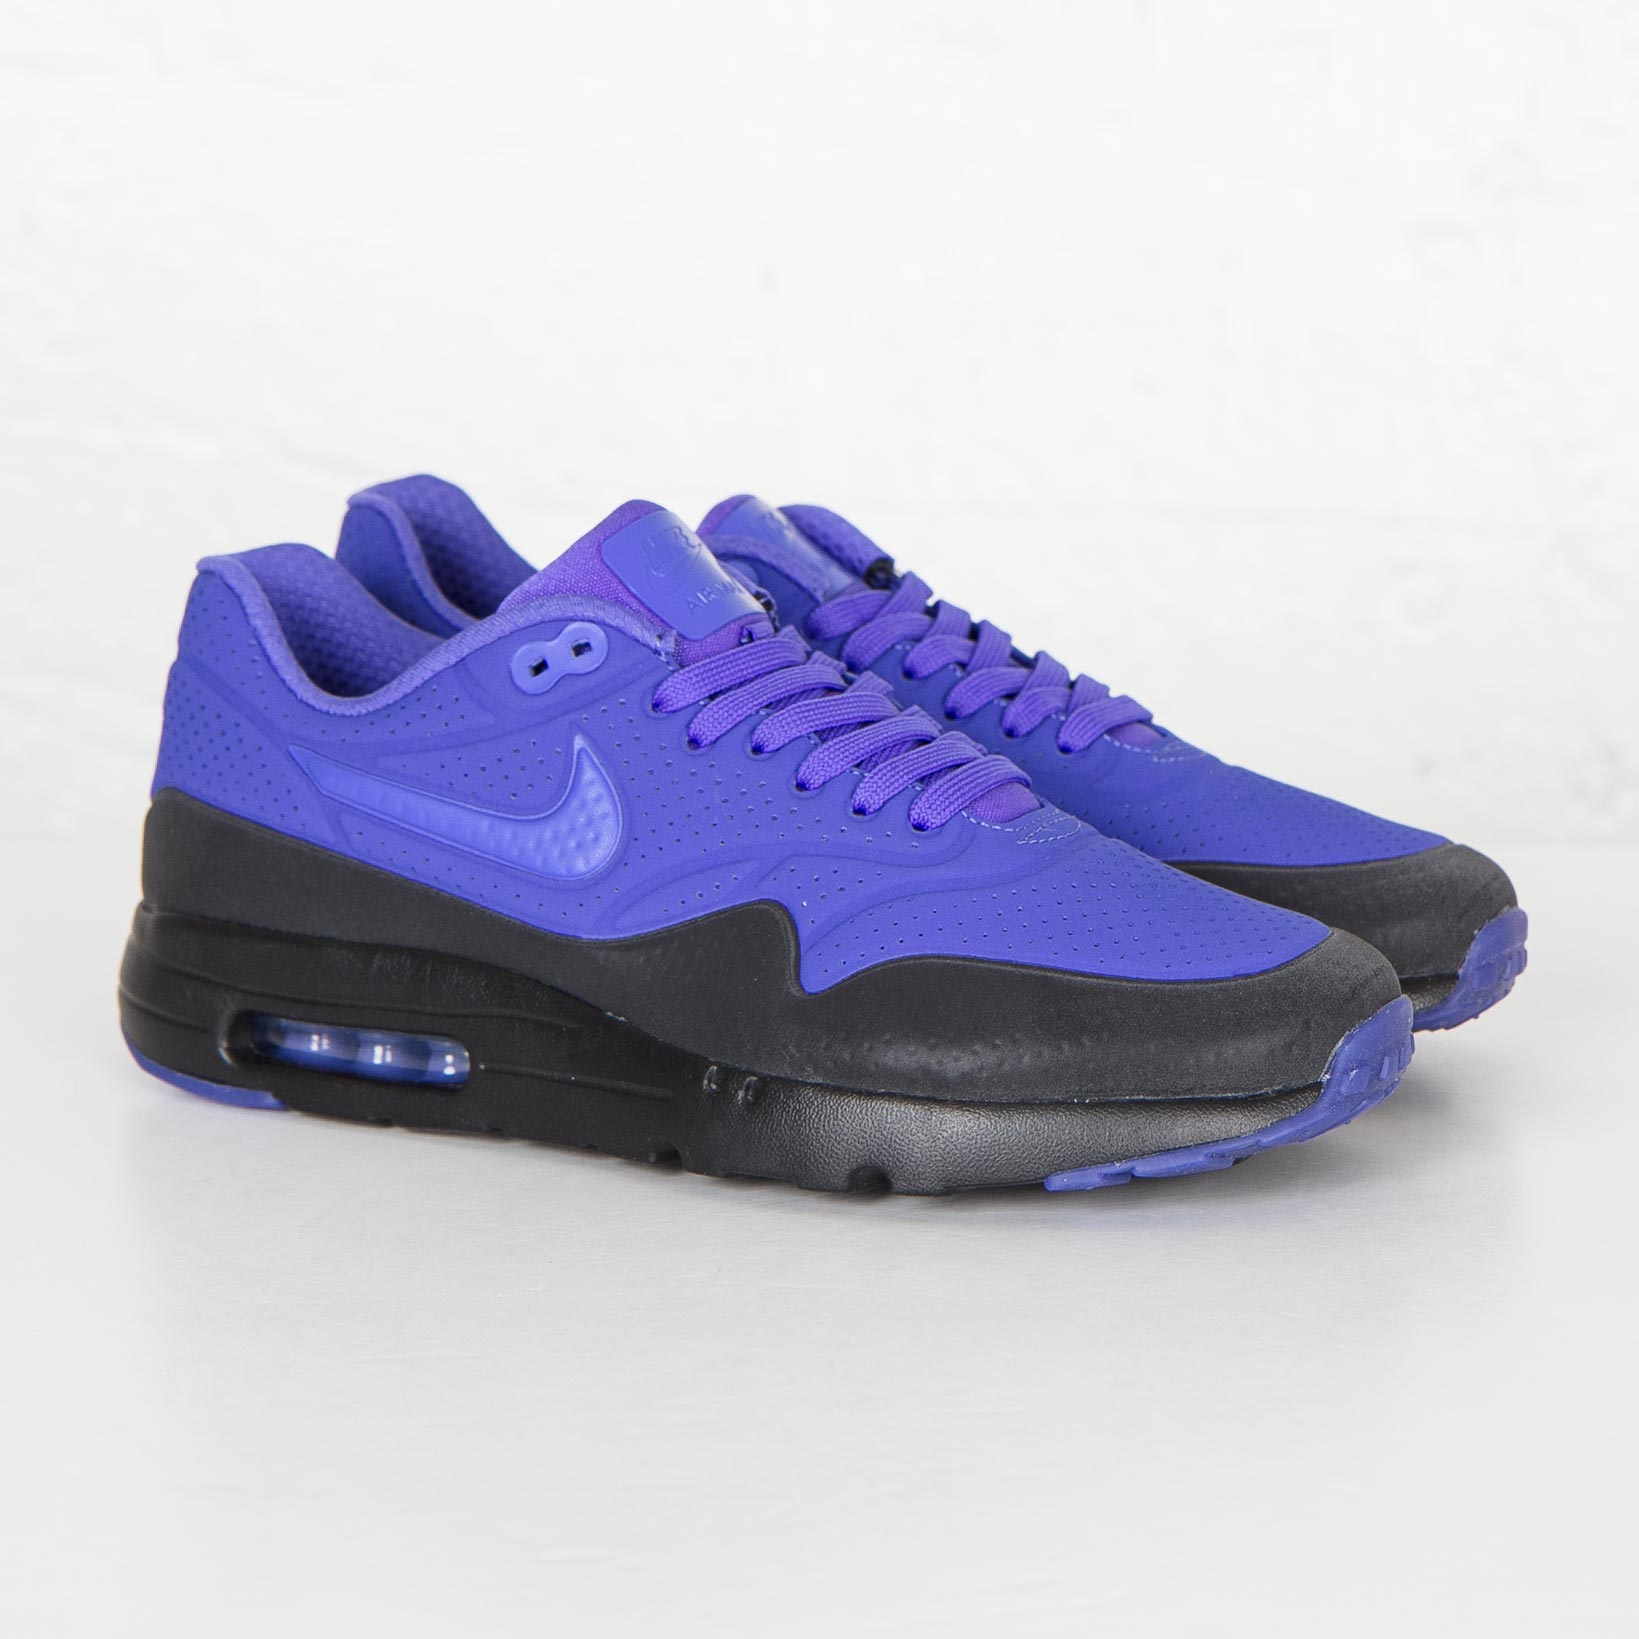 67bd568bc6c8 Nike Air Max 1 Ultra Moire - 705297-500 - Sneakersnstuff